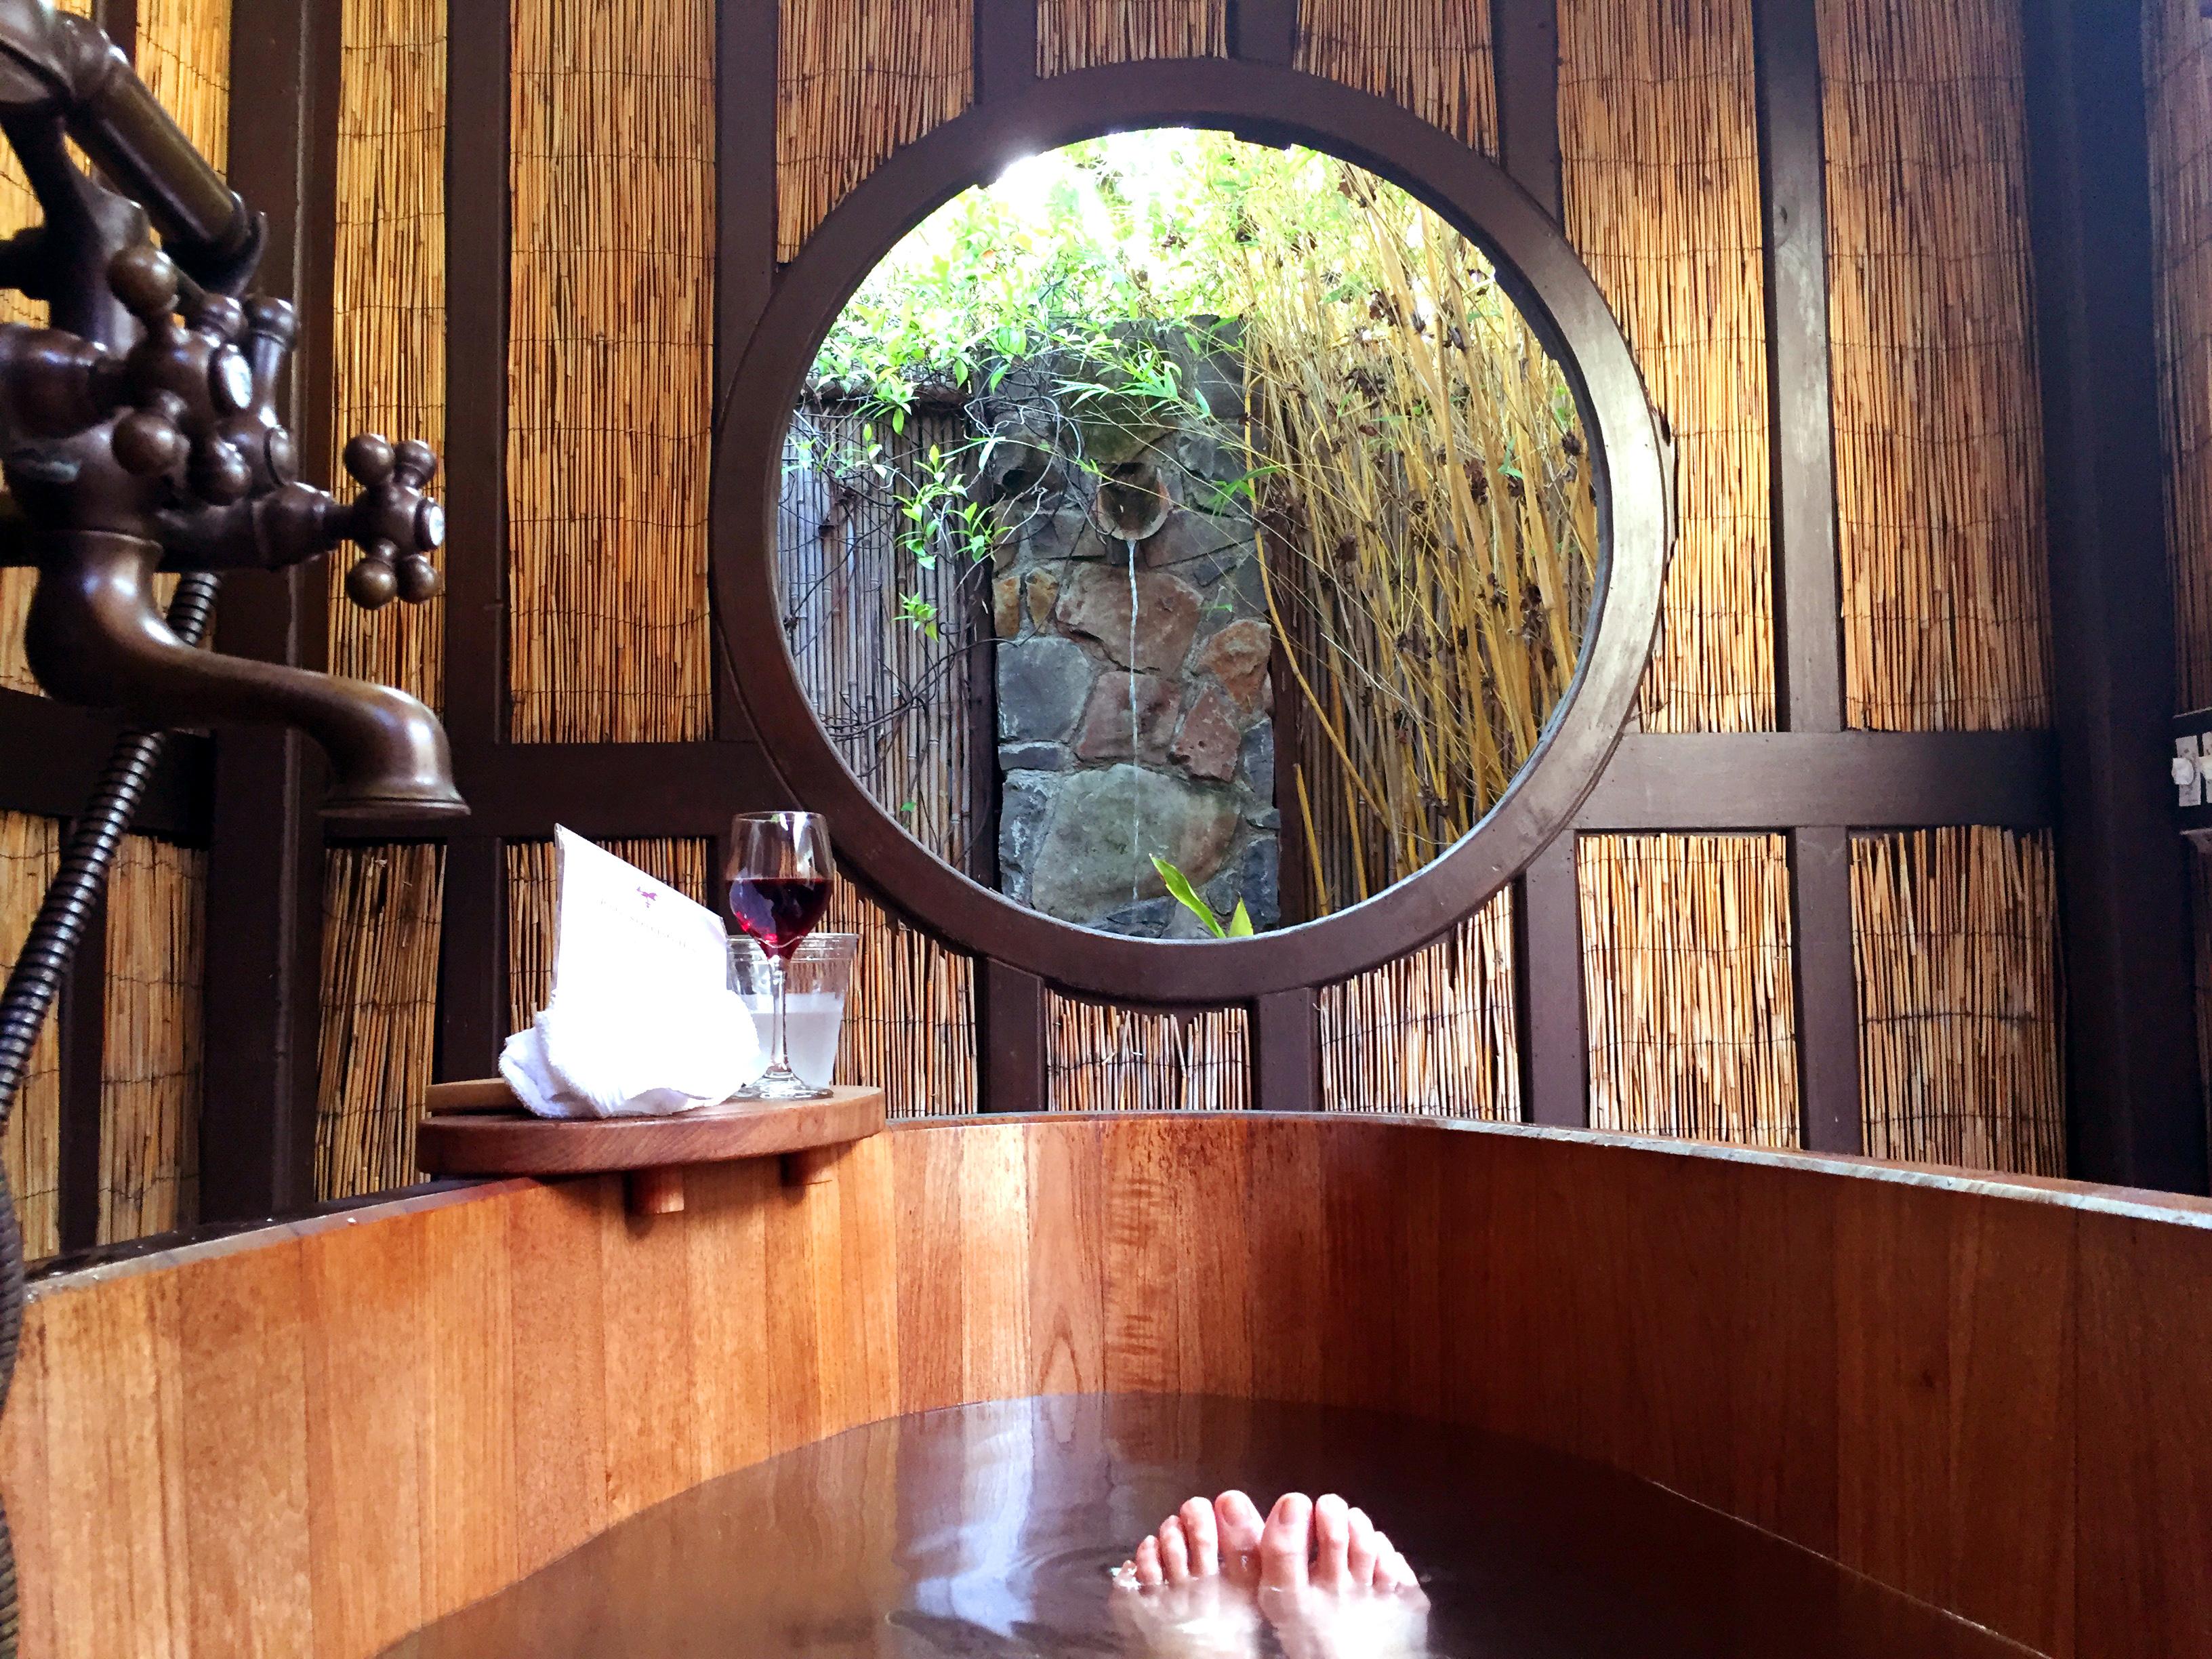 MacArthur Hotel and Spa, Sonoma California outdoor bath